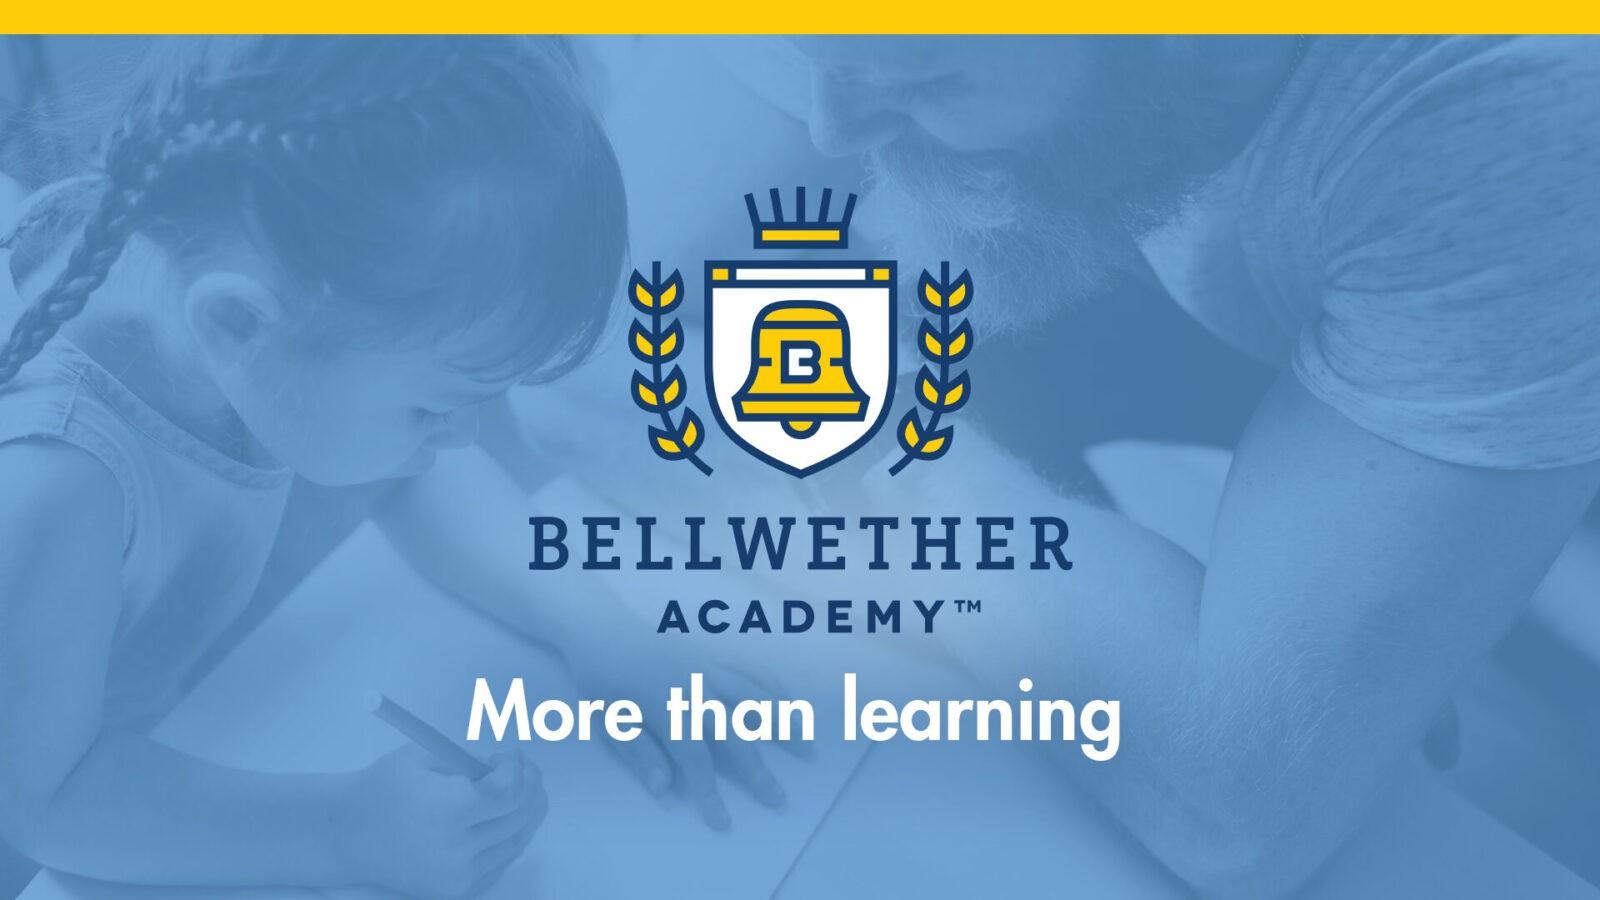 Bellwether Academy